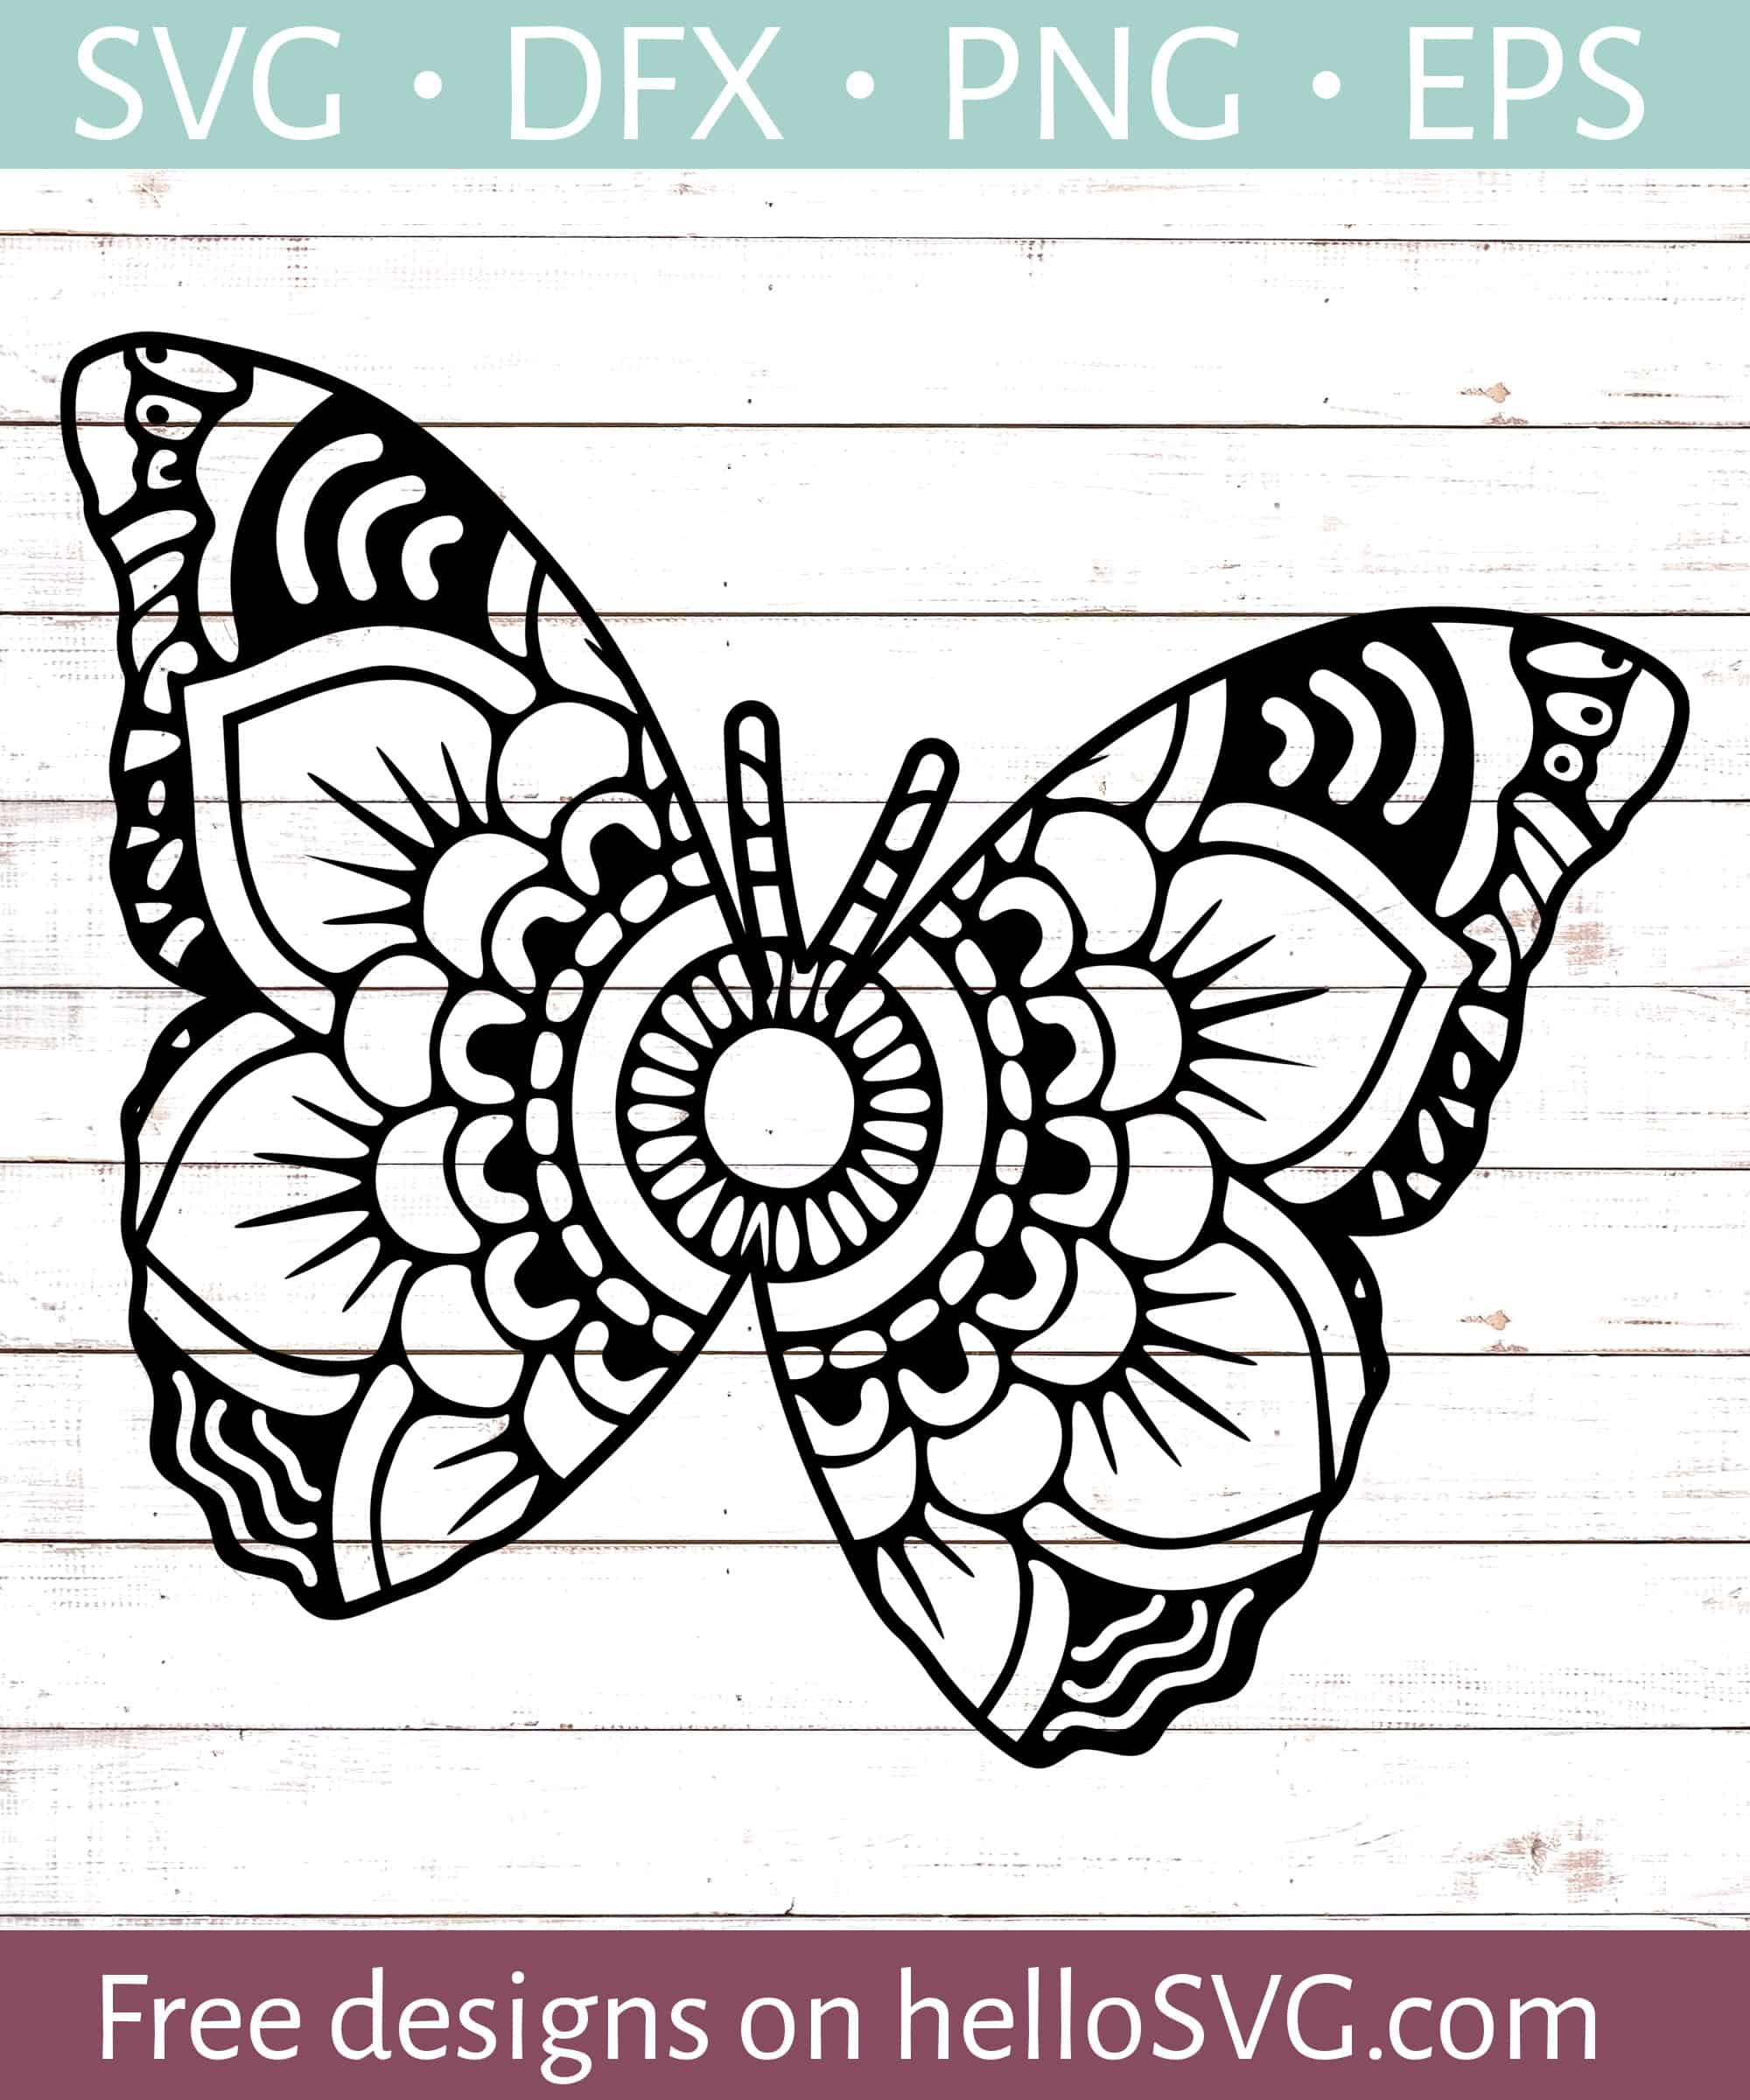 Mandala Svg Free Download : mandala, download, Mandala, Butterfly, Files, HelloSVG.com